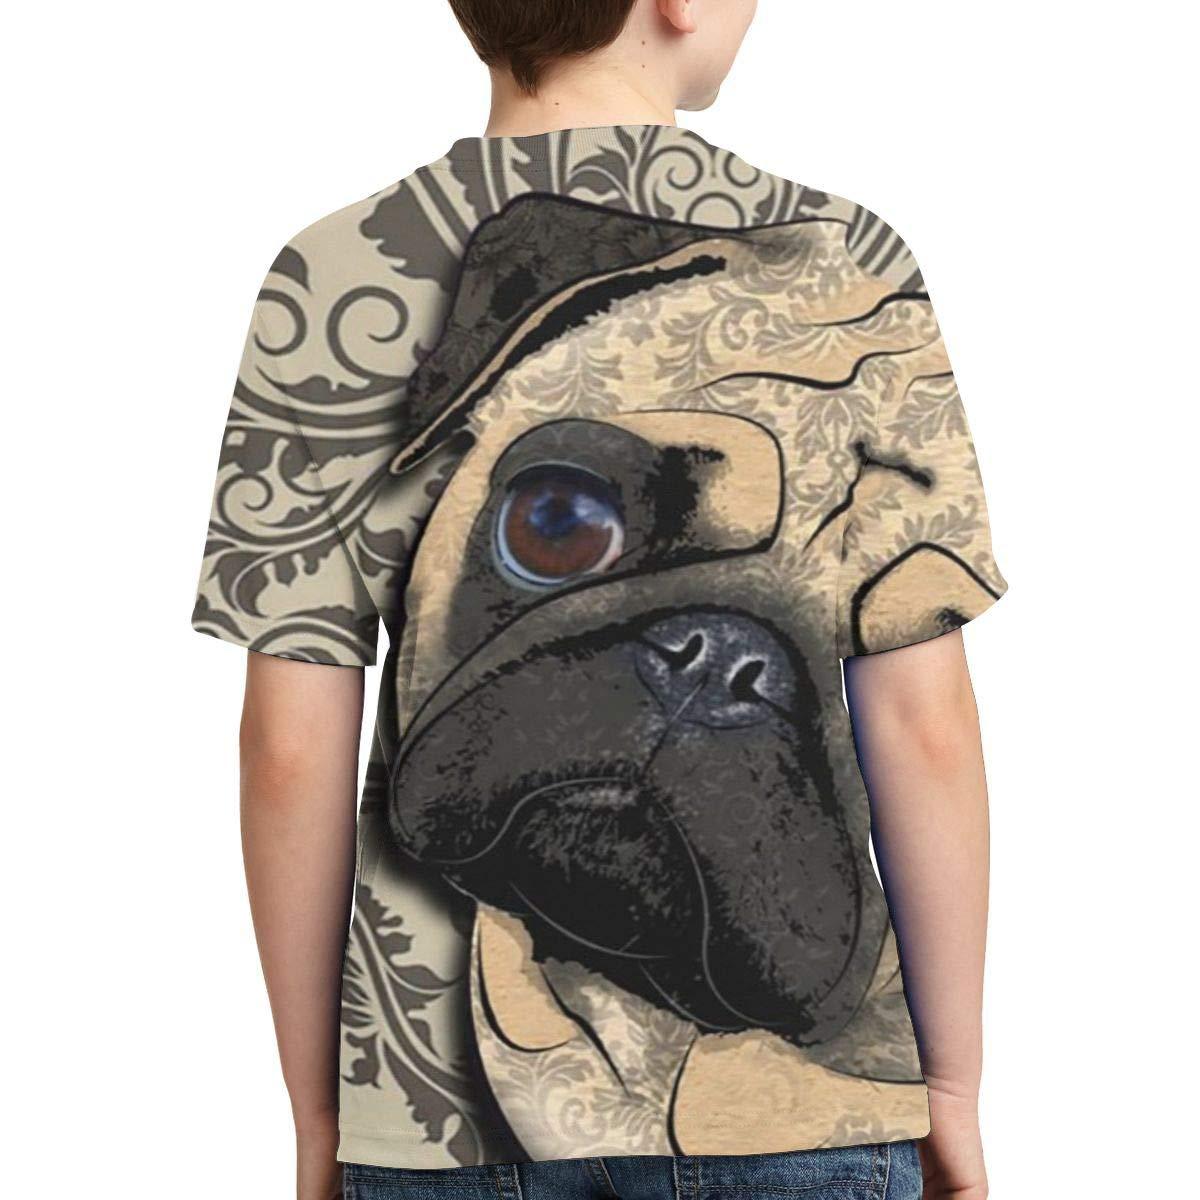 Fashion Tunic Shirt Dress XS-XL Vy32jg-2 Short-Sleeve Cute Pug Dog T-Shirts for Children